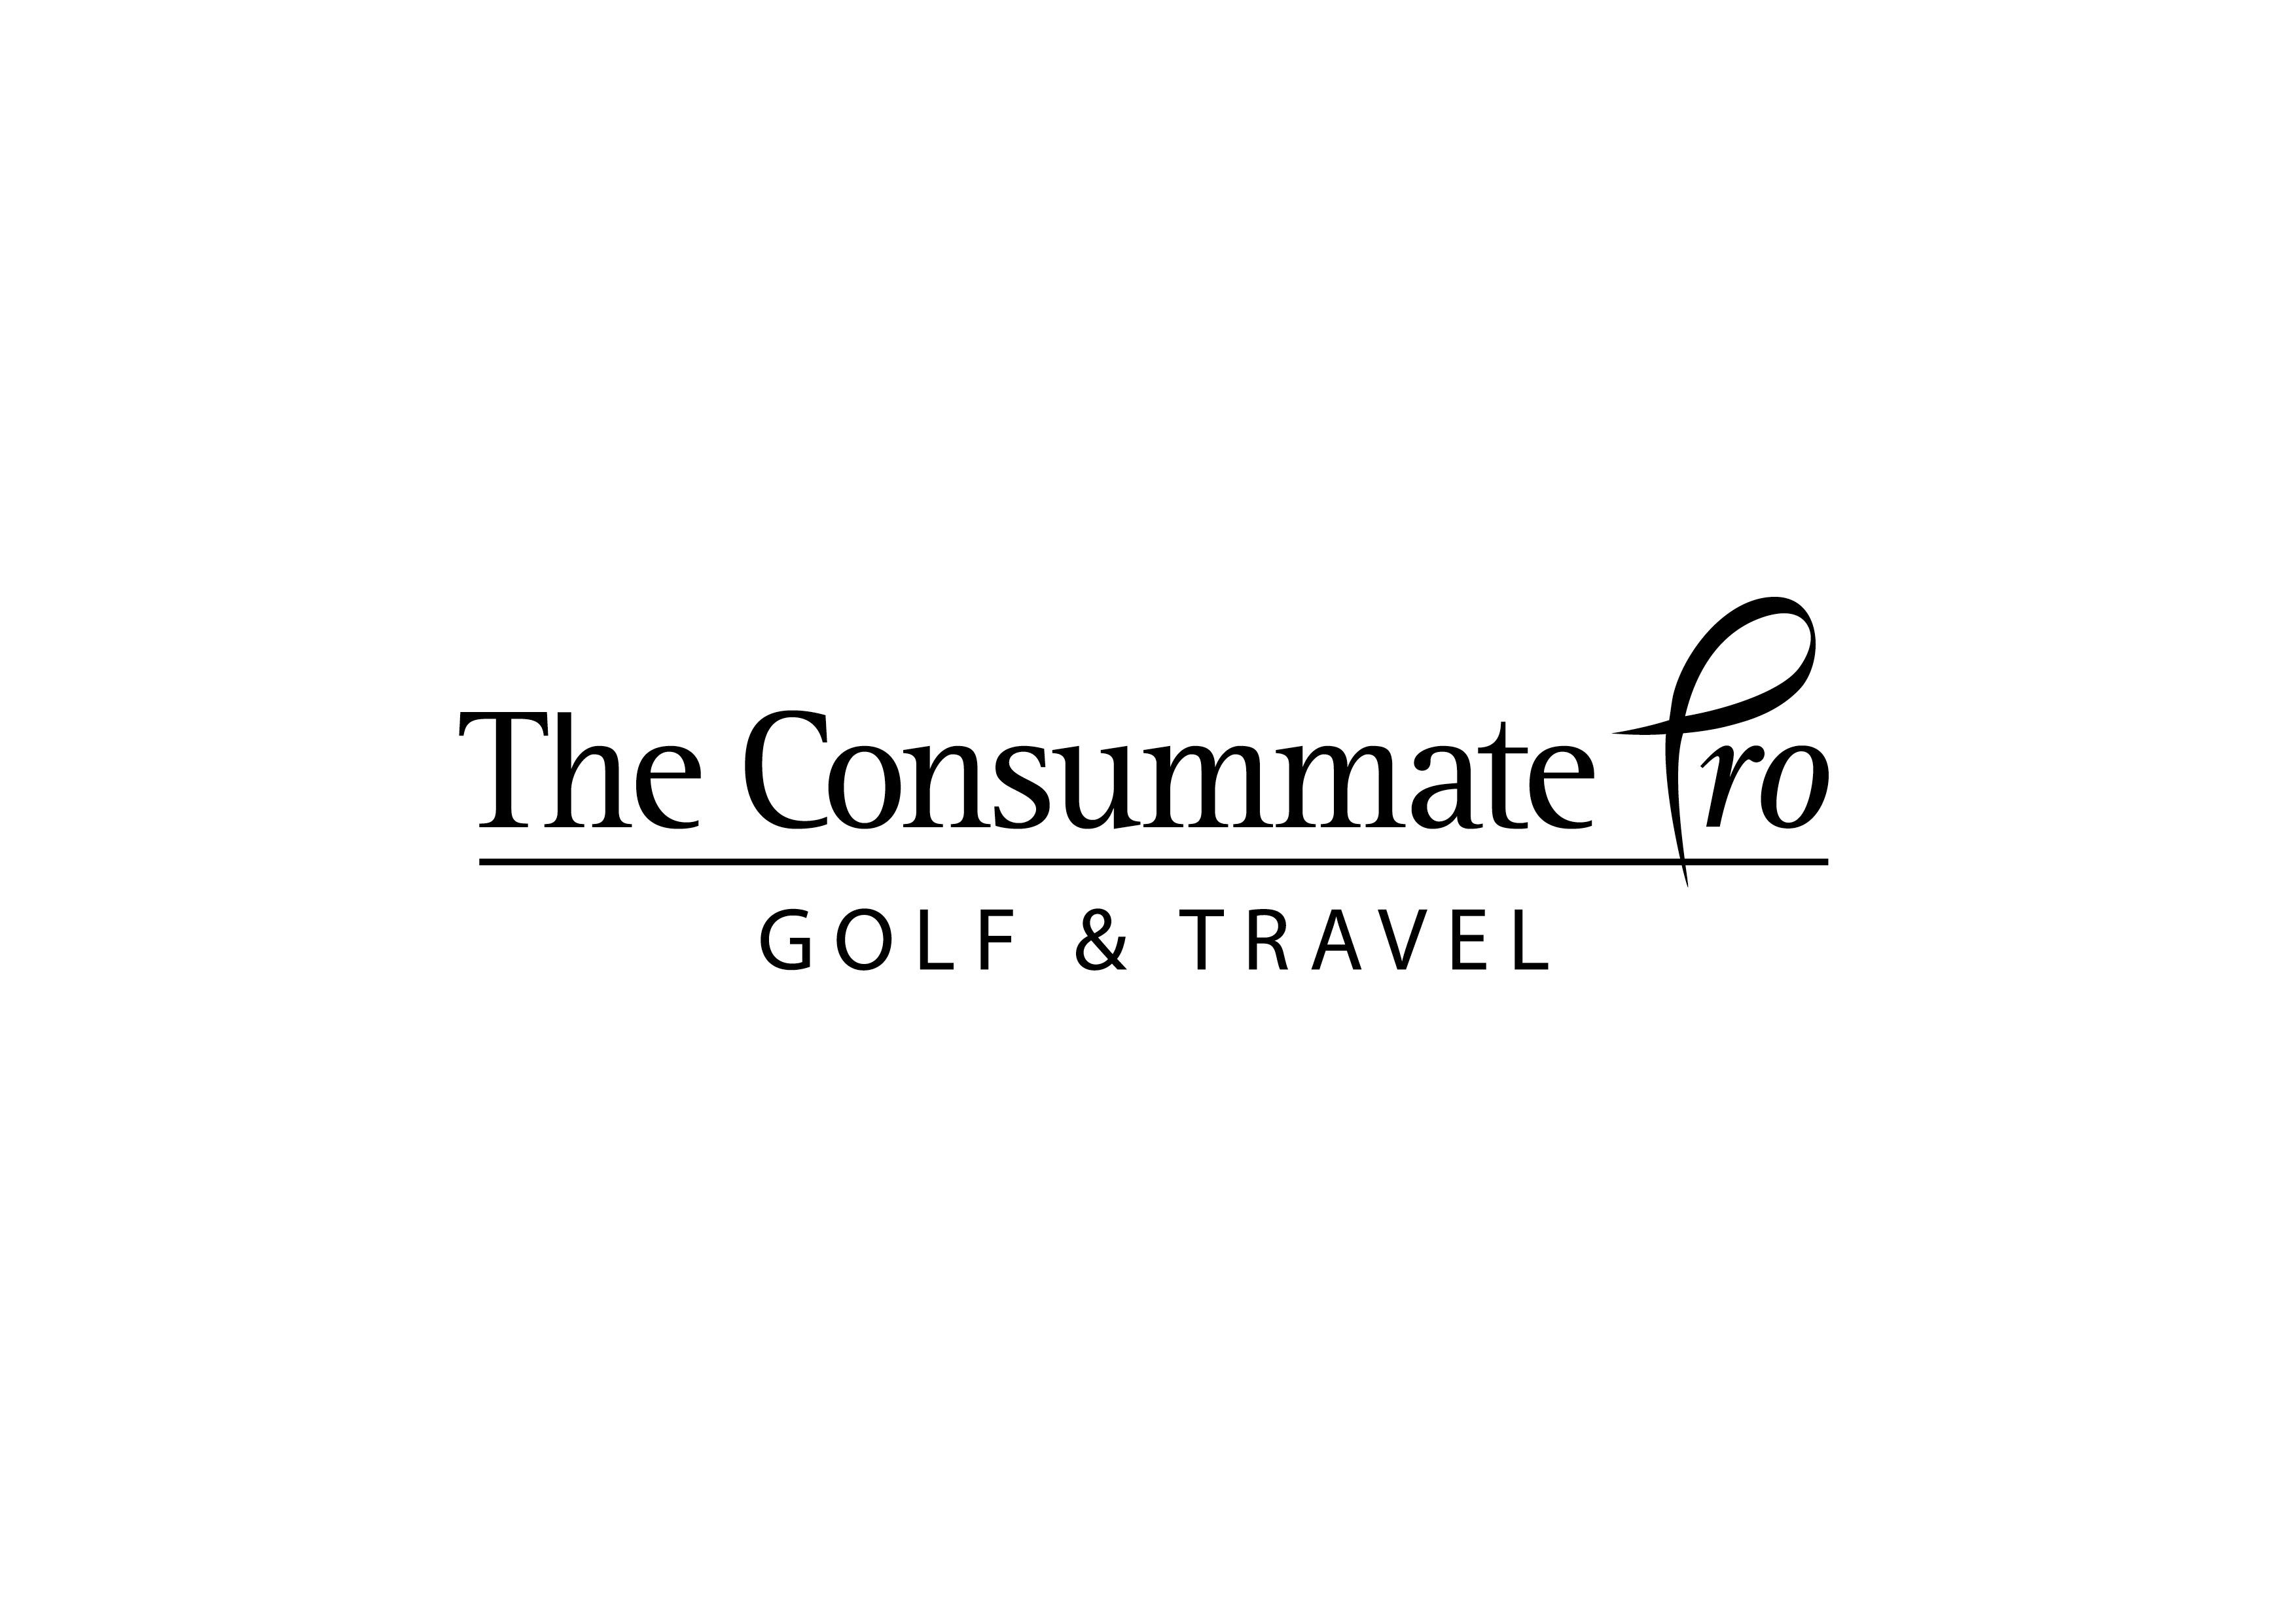 The Consummate Pro